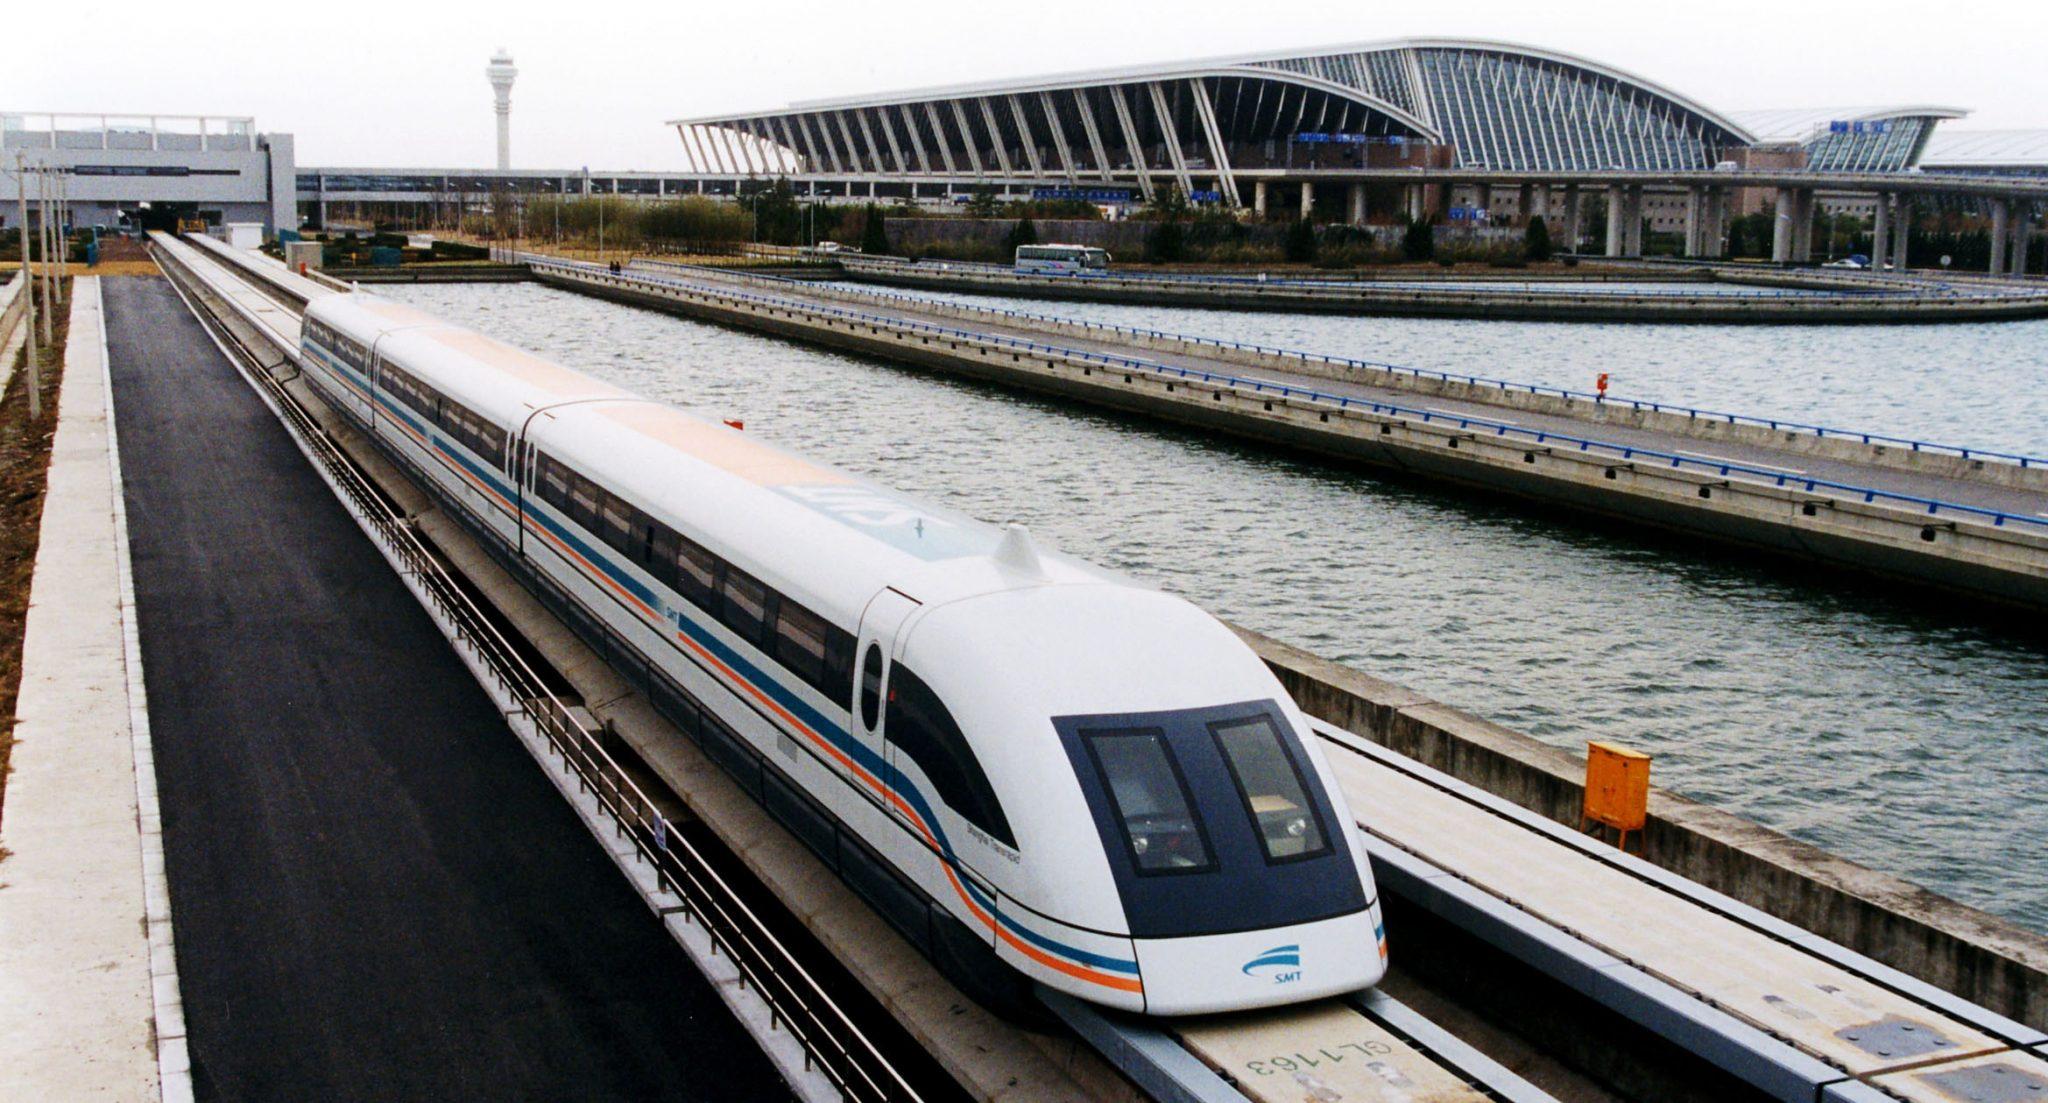 Future of Transport :: Maglev trains // www.skedgo.com/blog